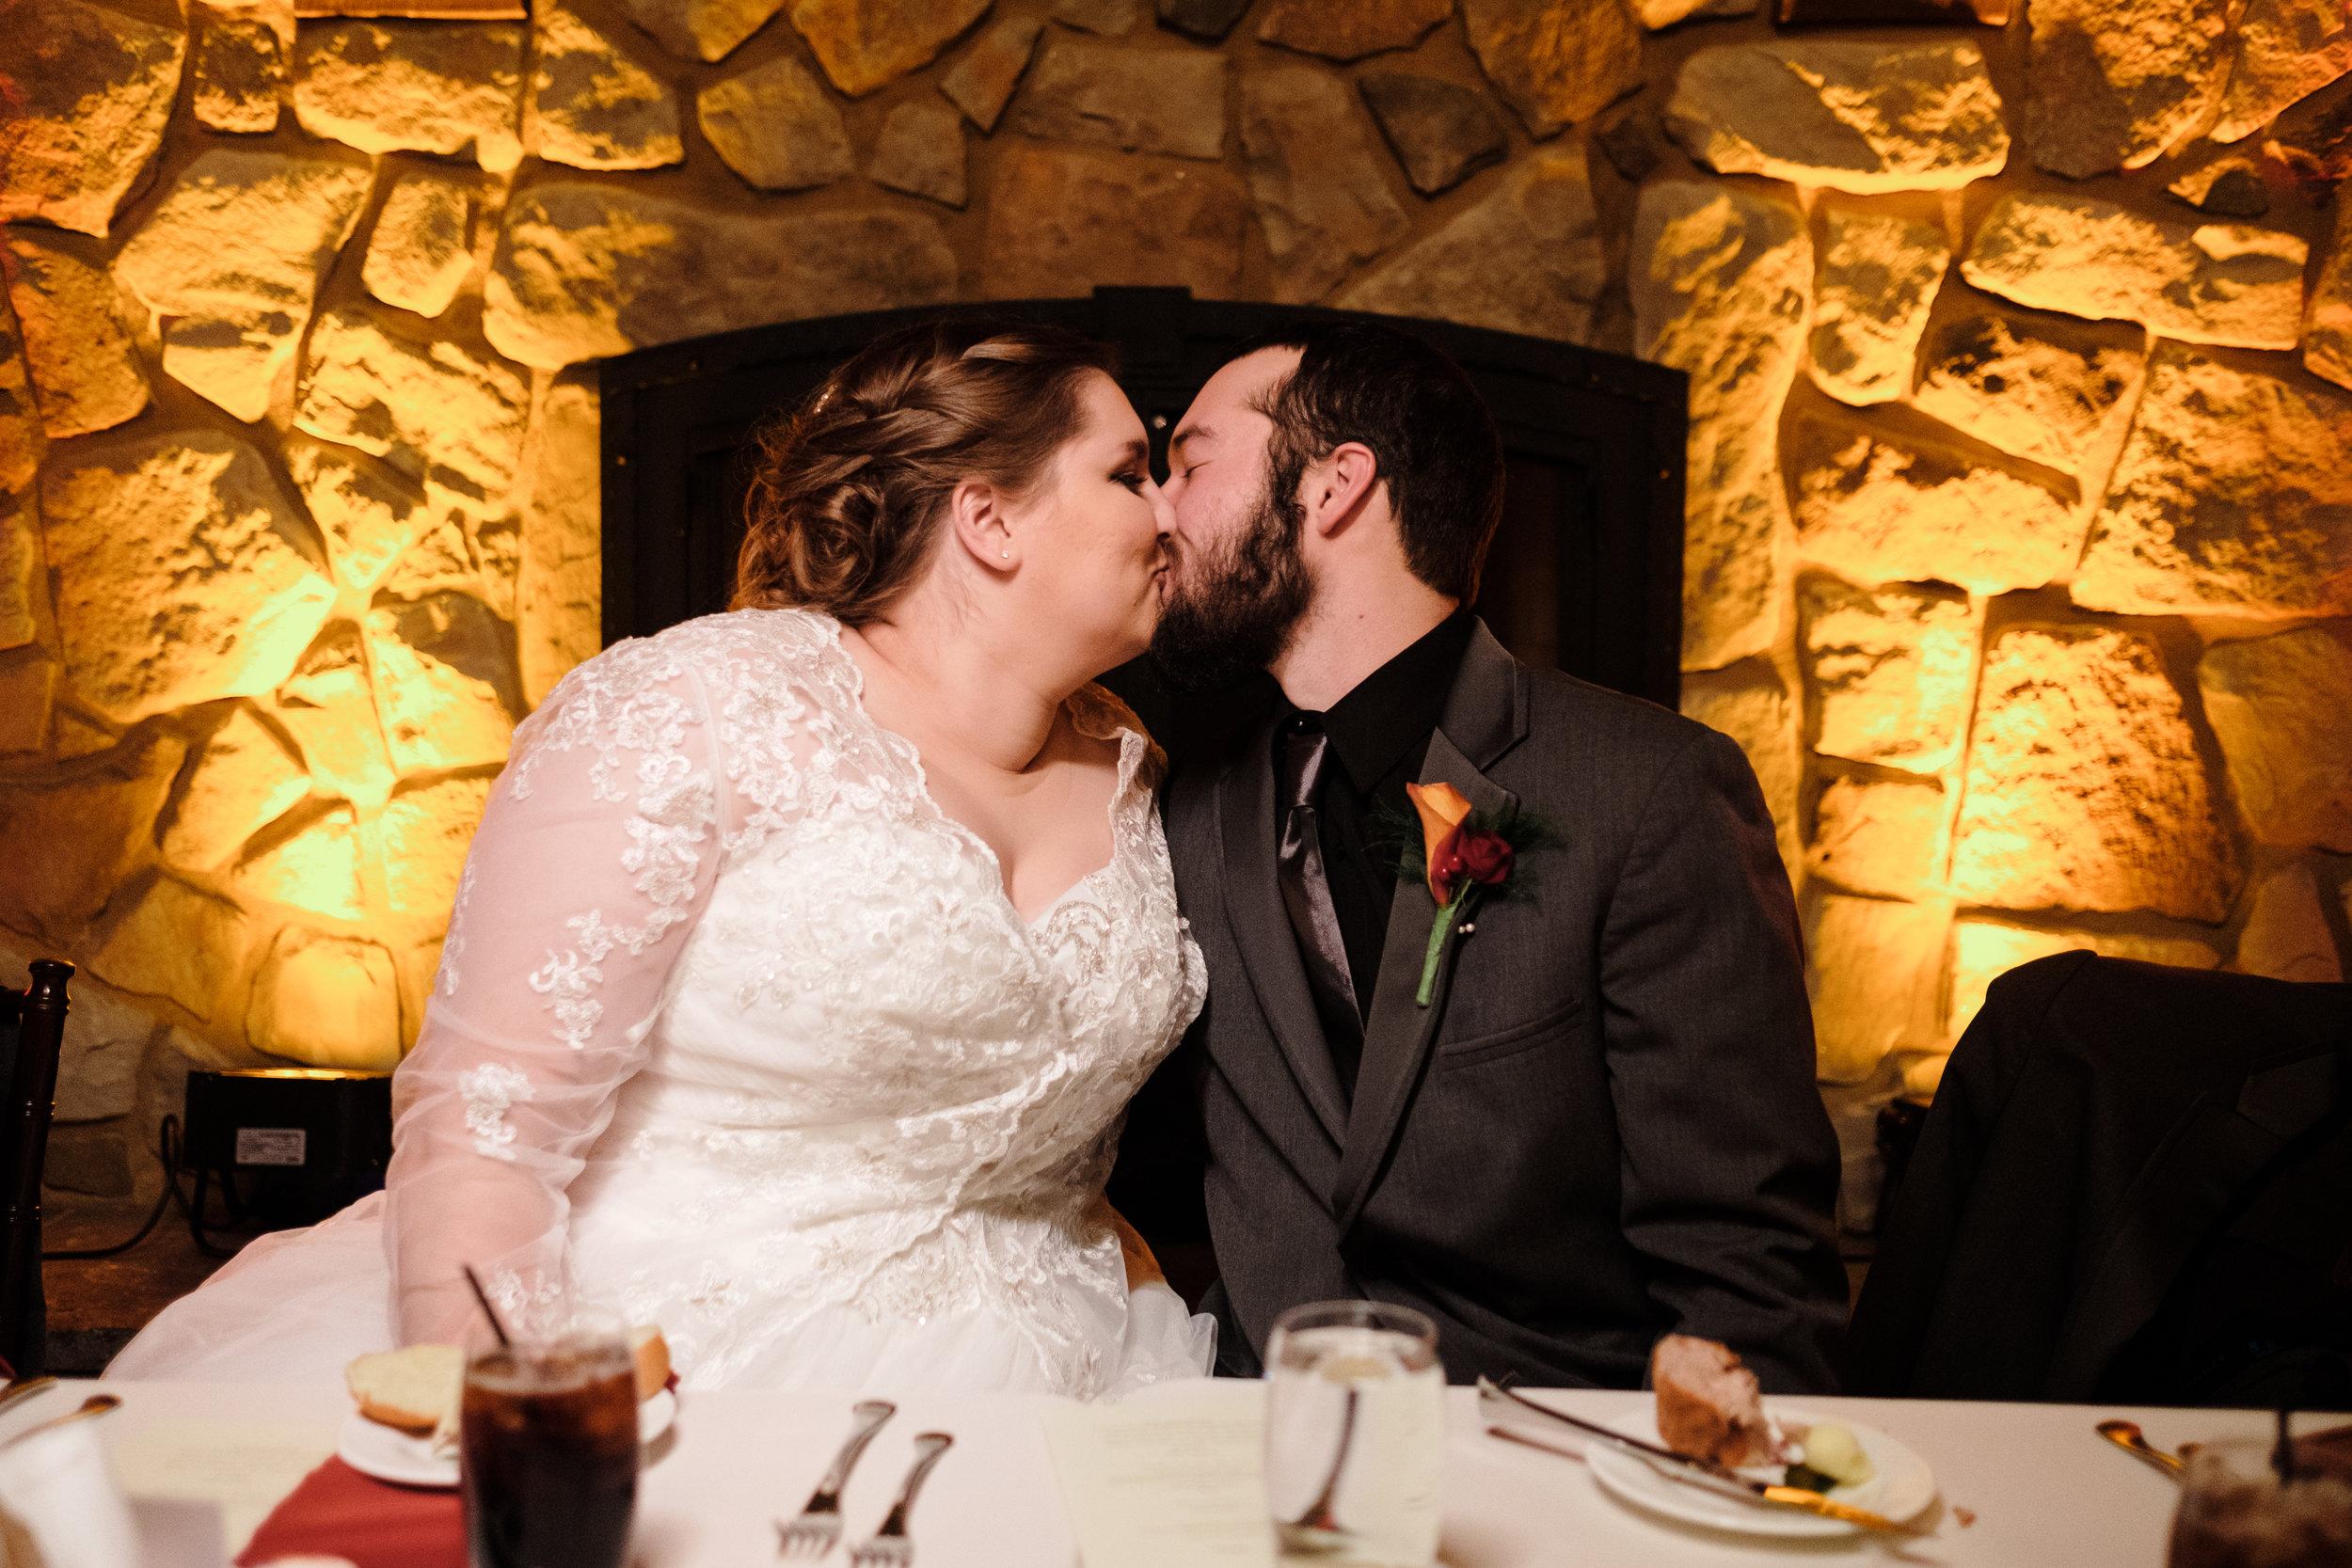 18-12-28 Corinne-Henry-Pavilion-Wedding-489.jpg